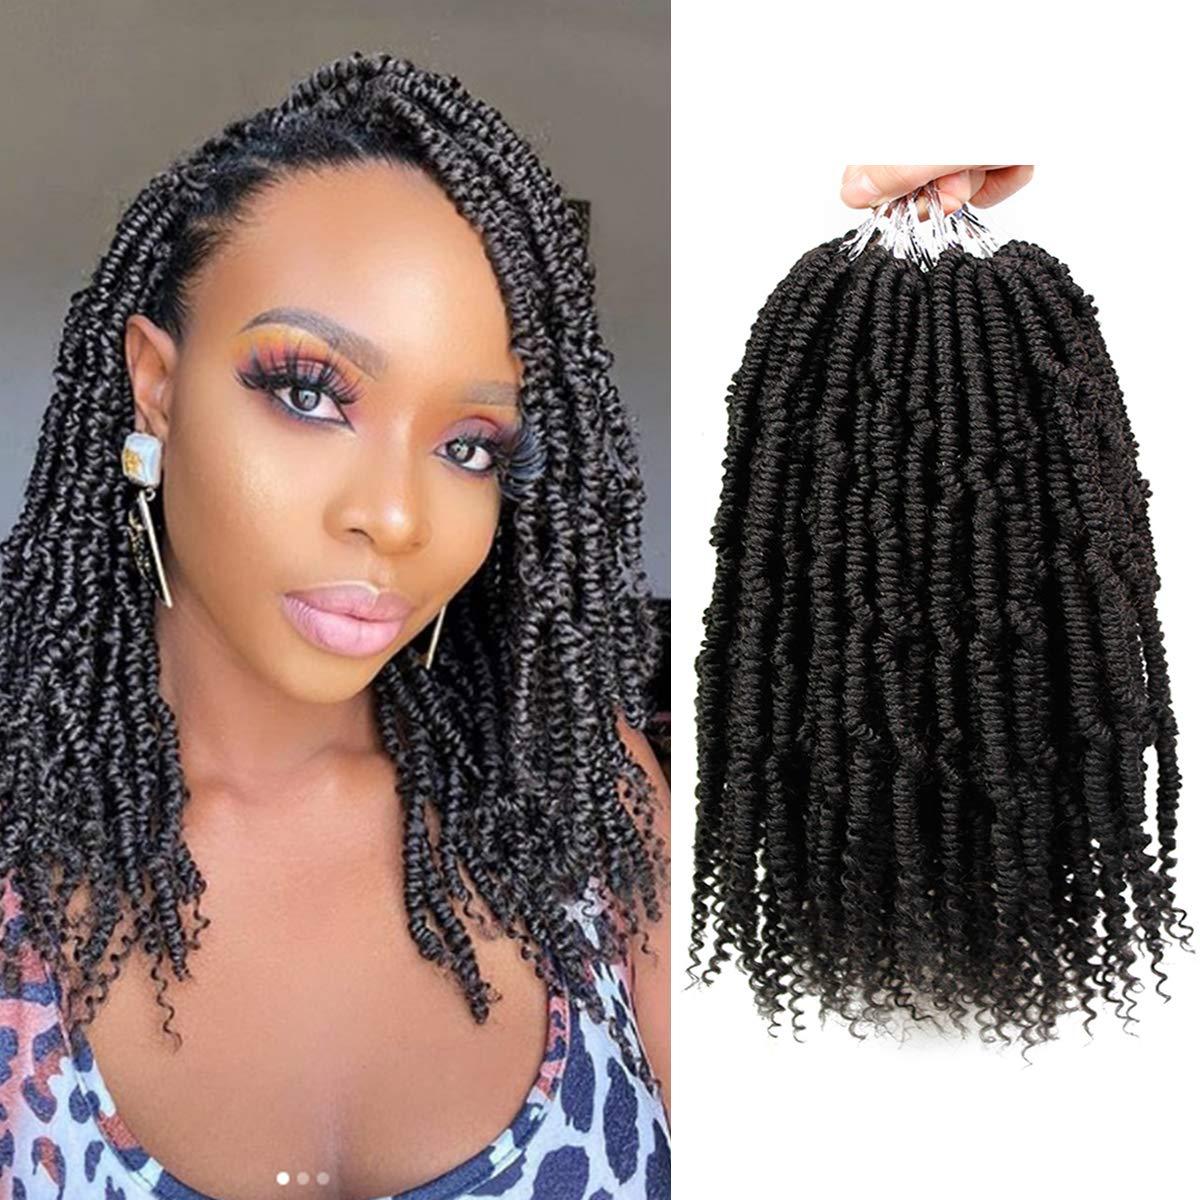 Amazon Com 6 Packs Bomb Twist Crochet Hair 14 Inch Spring Twist Crochet Braids Pre Looped Pre Twisted Passion Twist Hair Synthetic Senegalese Twist Nubian Twist Curly Hair Extensions 1b Beauty